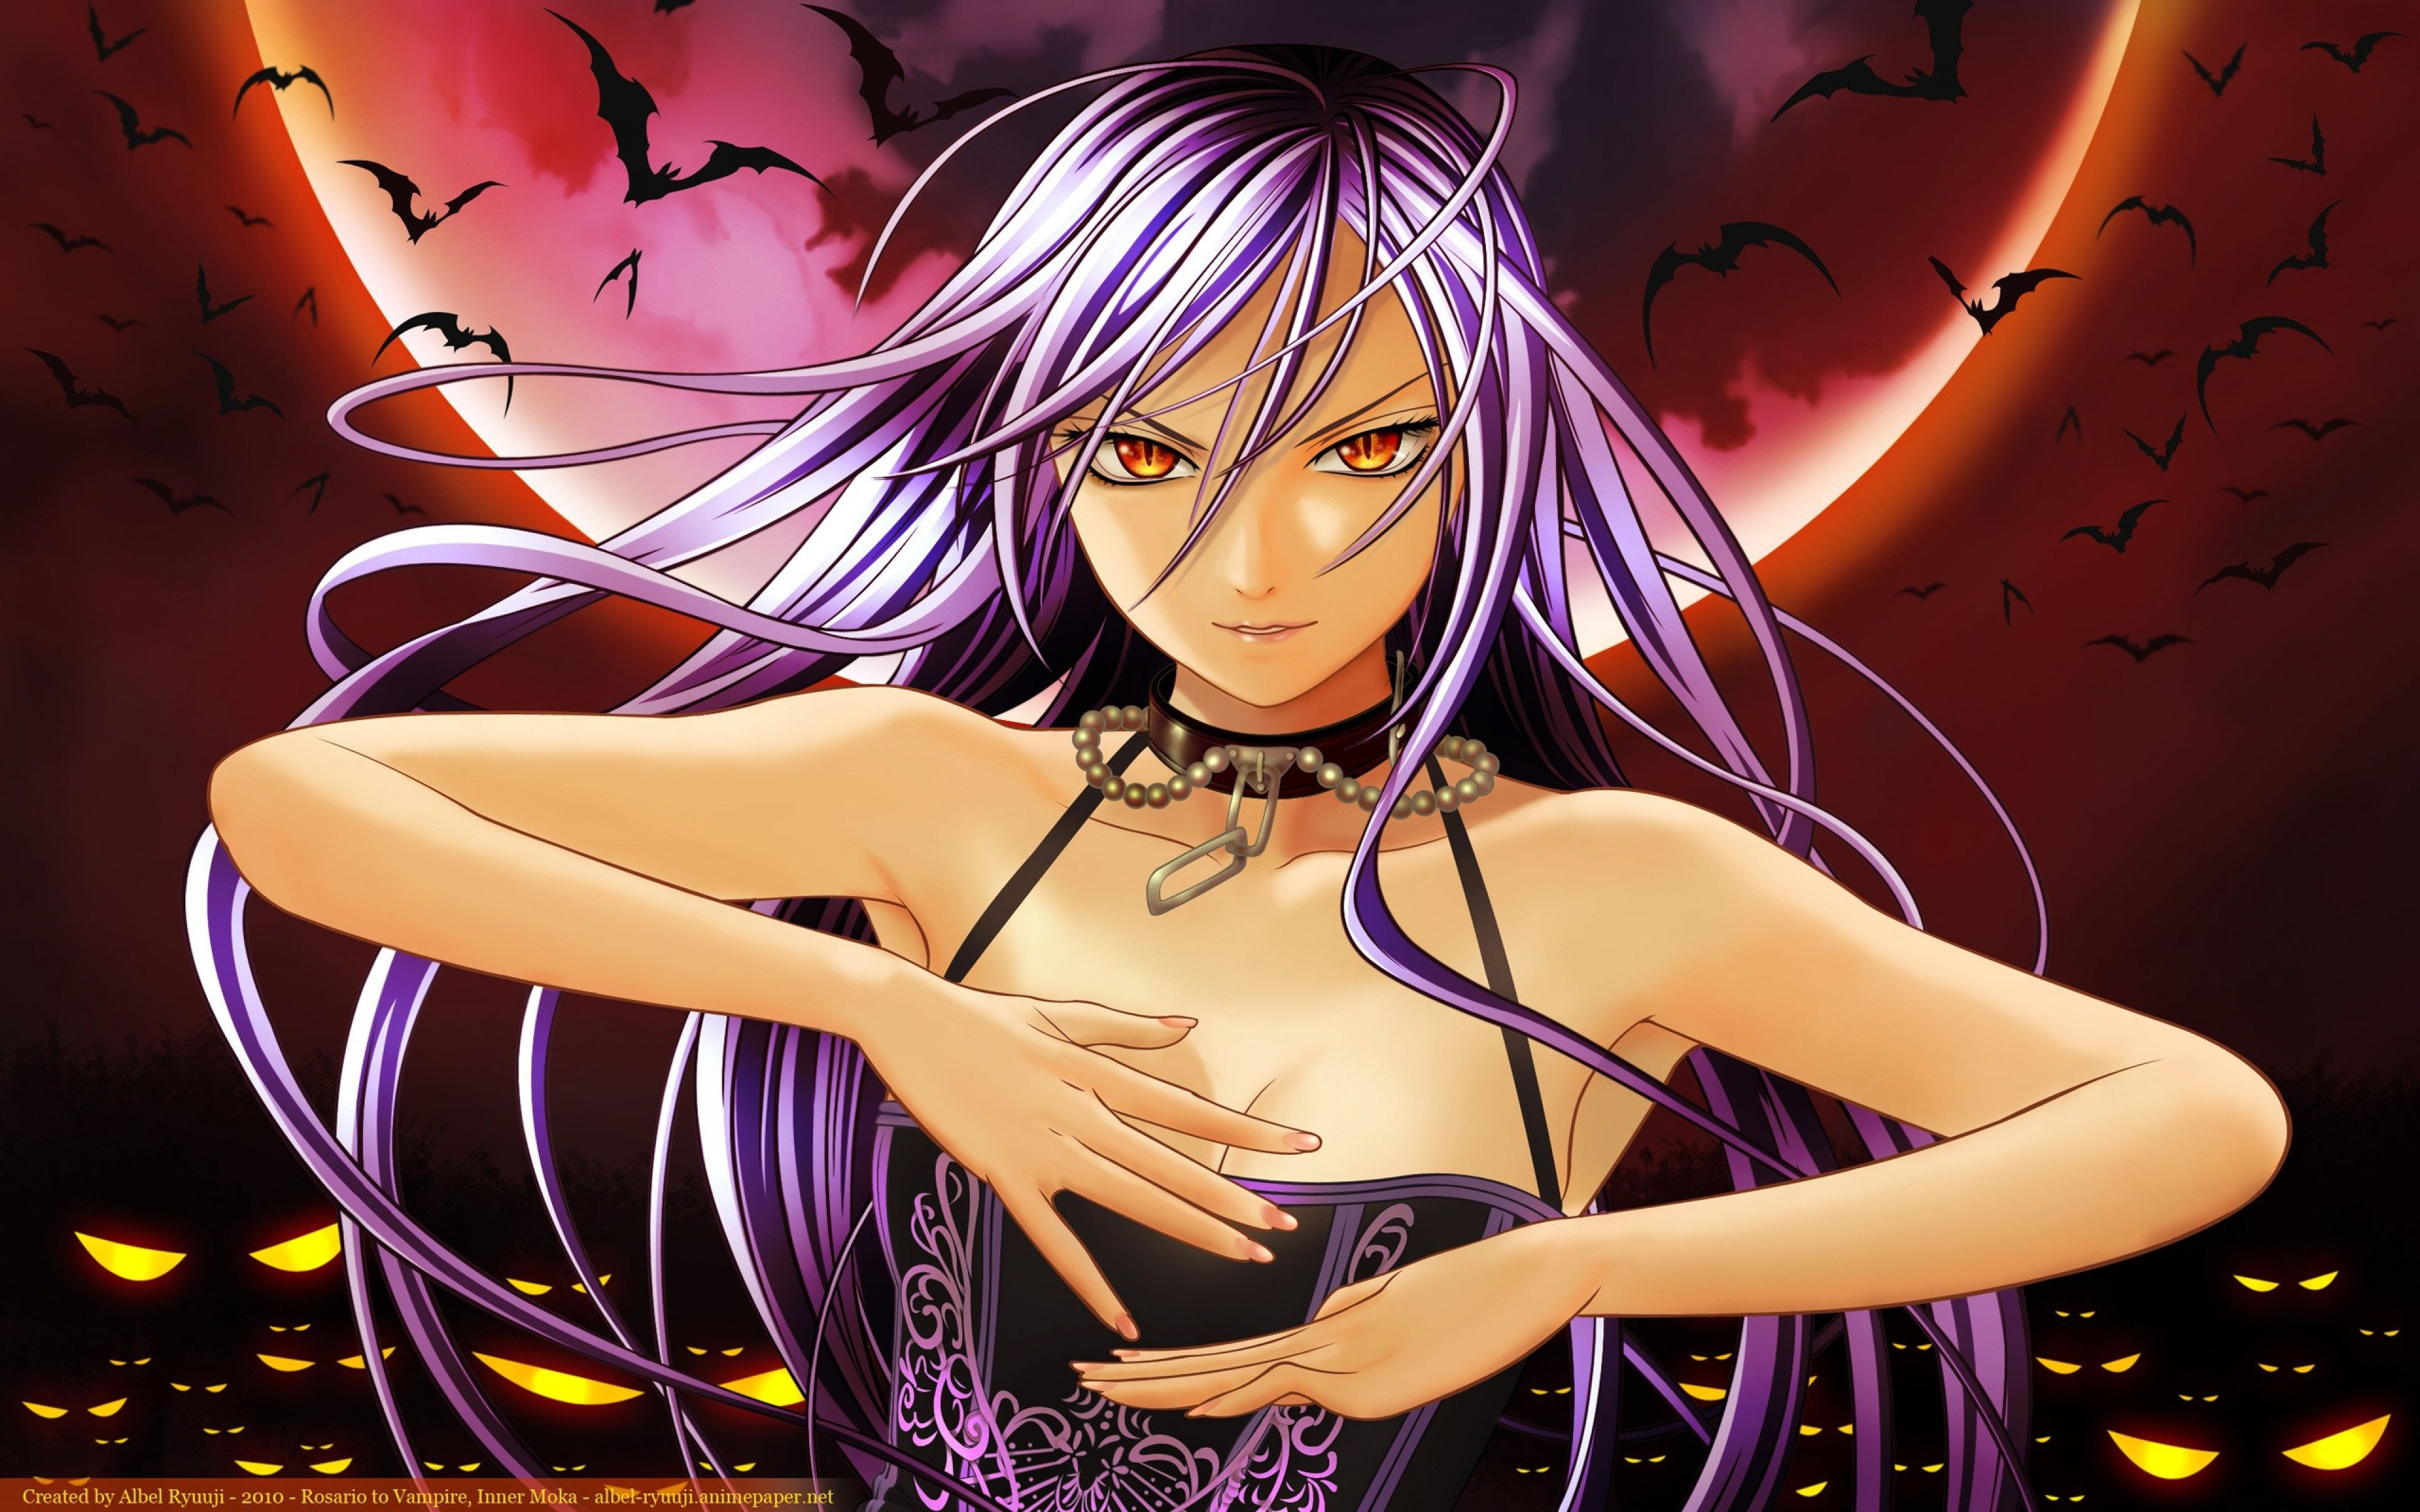 Hentai Vampire Girl pertaining to 3840x2400 wallpaper rosario vampire, girl, bat, moon | wallpapers